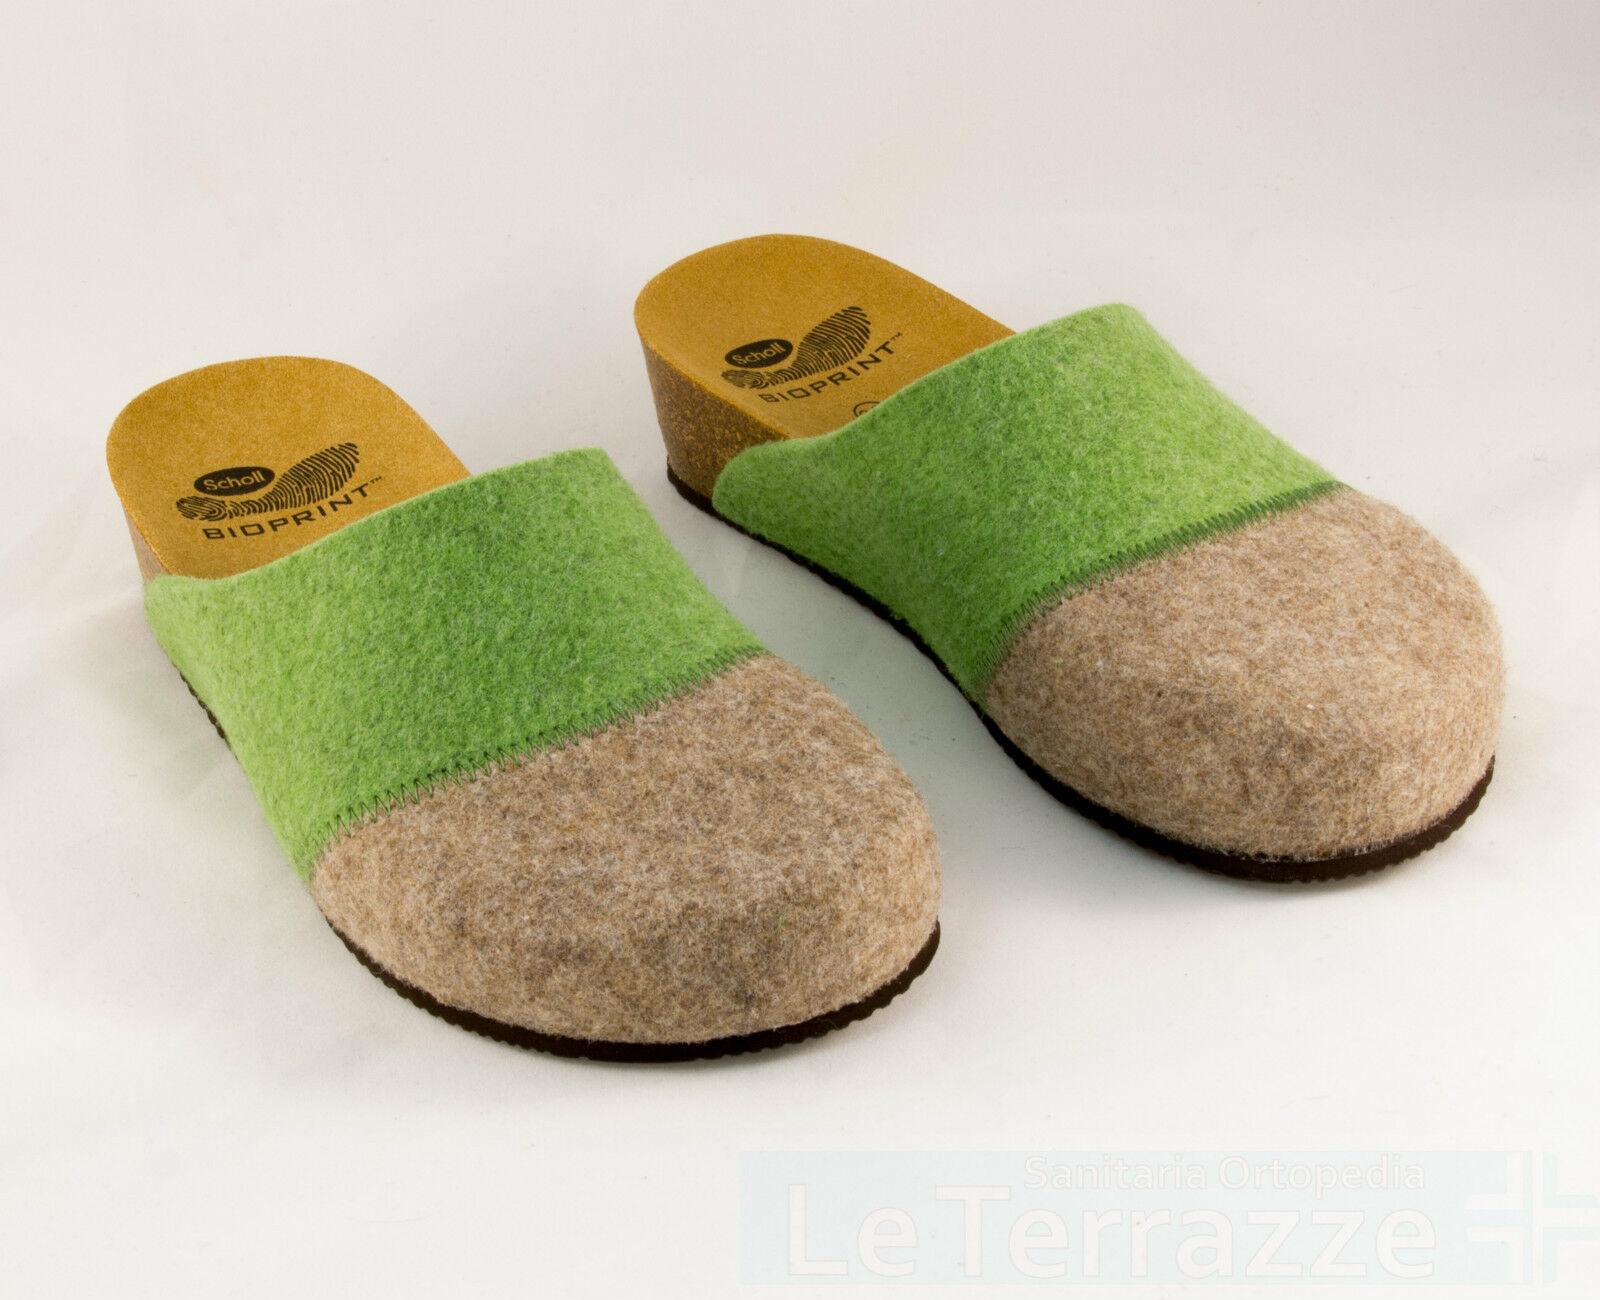 becb9a133c Dr Scholl Flaine sabout pantofola scarpa ciabatta bioprint sconto 20 ...